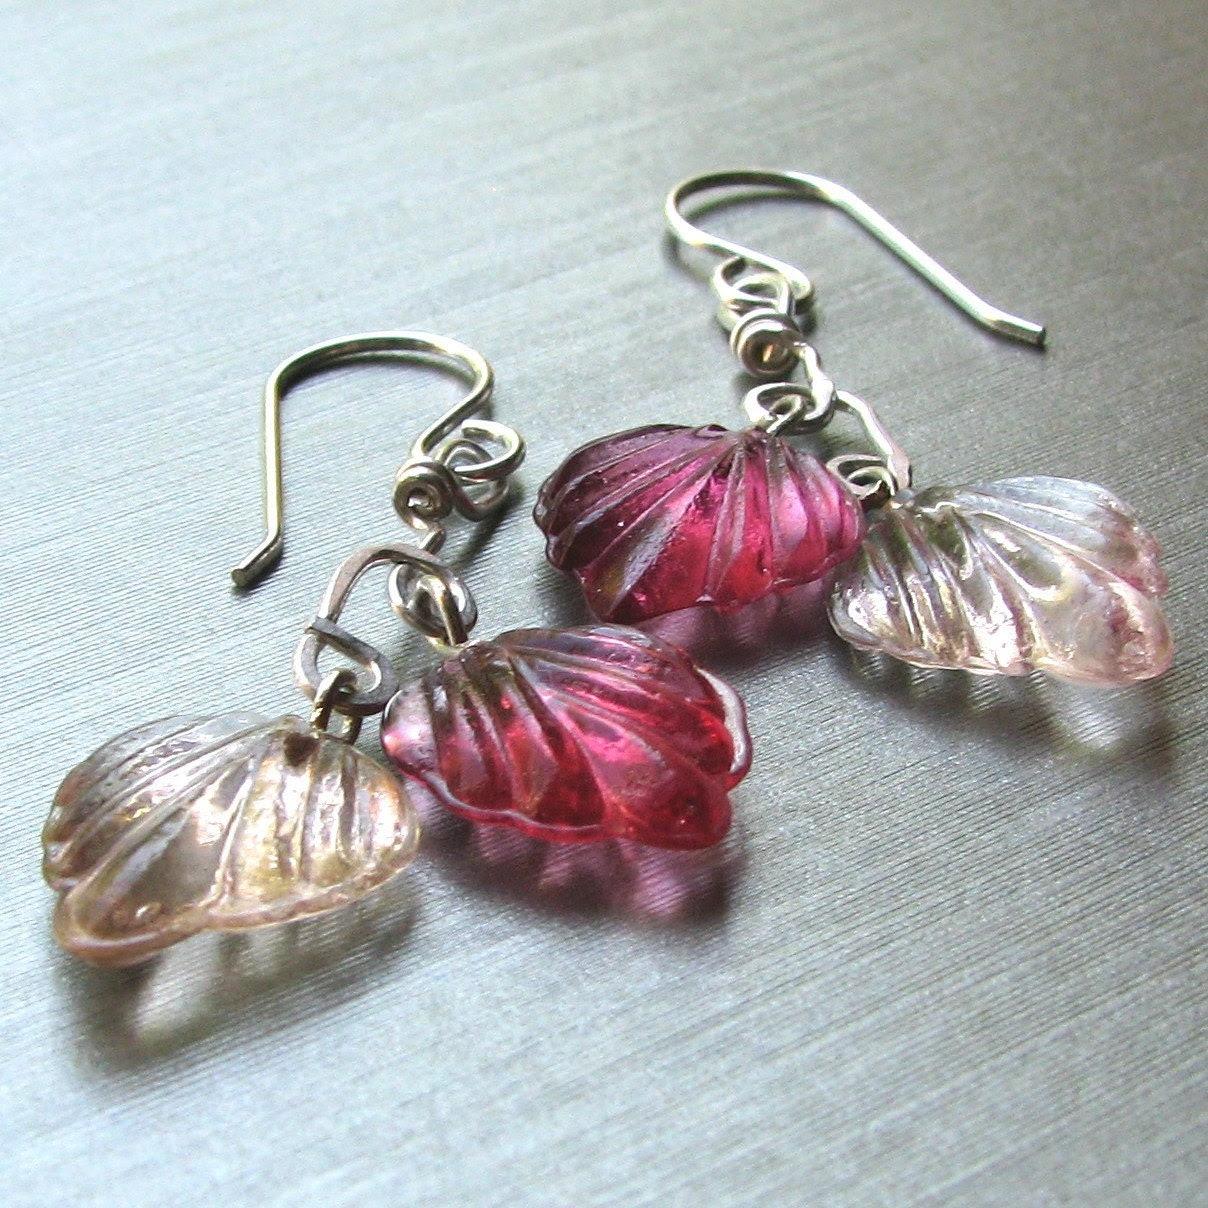 Adroit Jewelers Falling Leaves Earrings